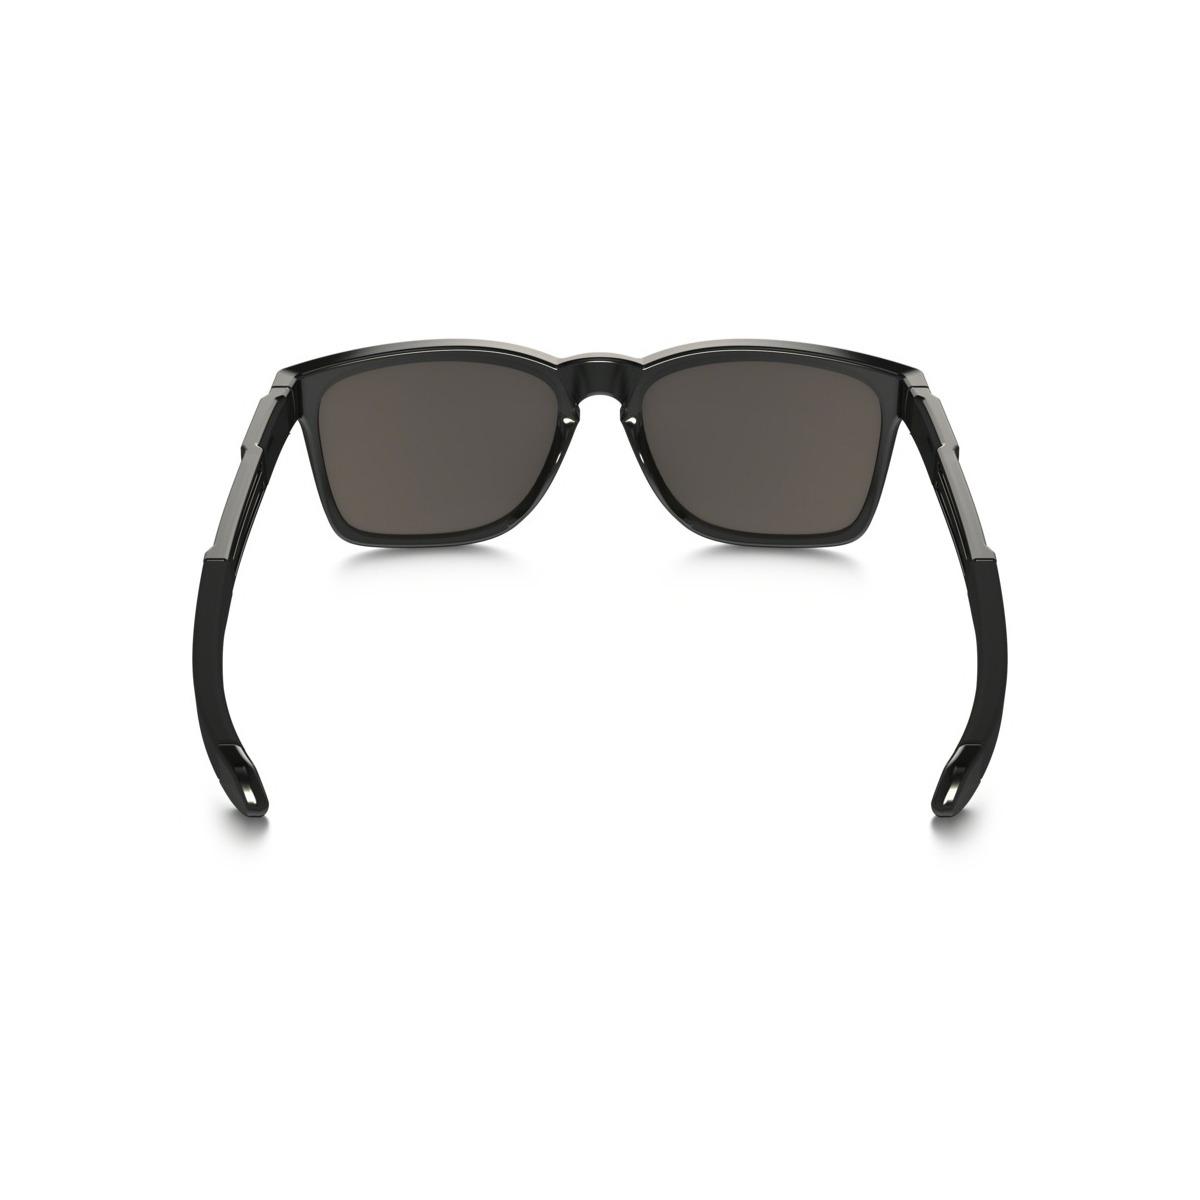 c2e69ded66 Óculos Oakley Catalyst Black Ink/lente Warm Grey - R$ 509,90 em ...